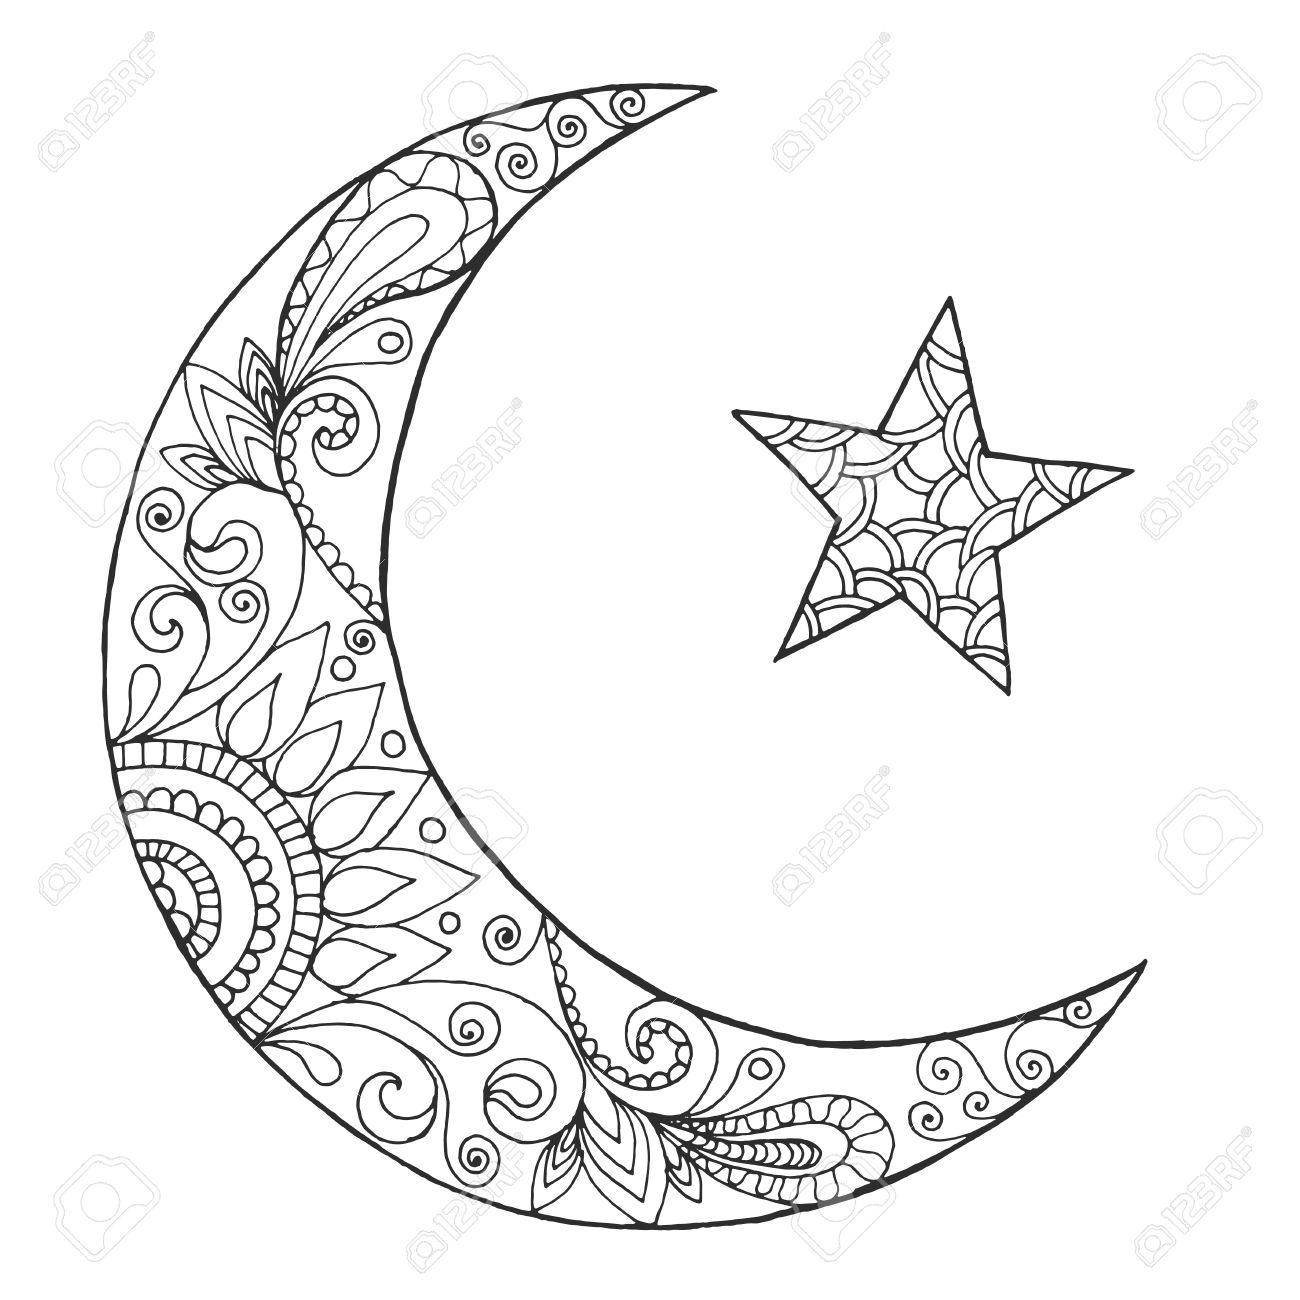 1300x1300 Ramadan Kareem Half Moon. Greeting Design Coloring Page. Engraved